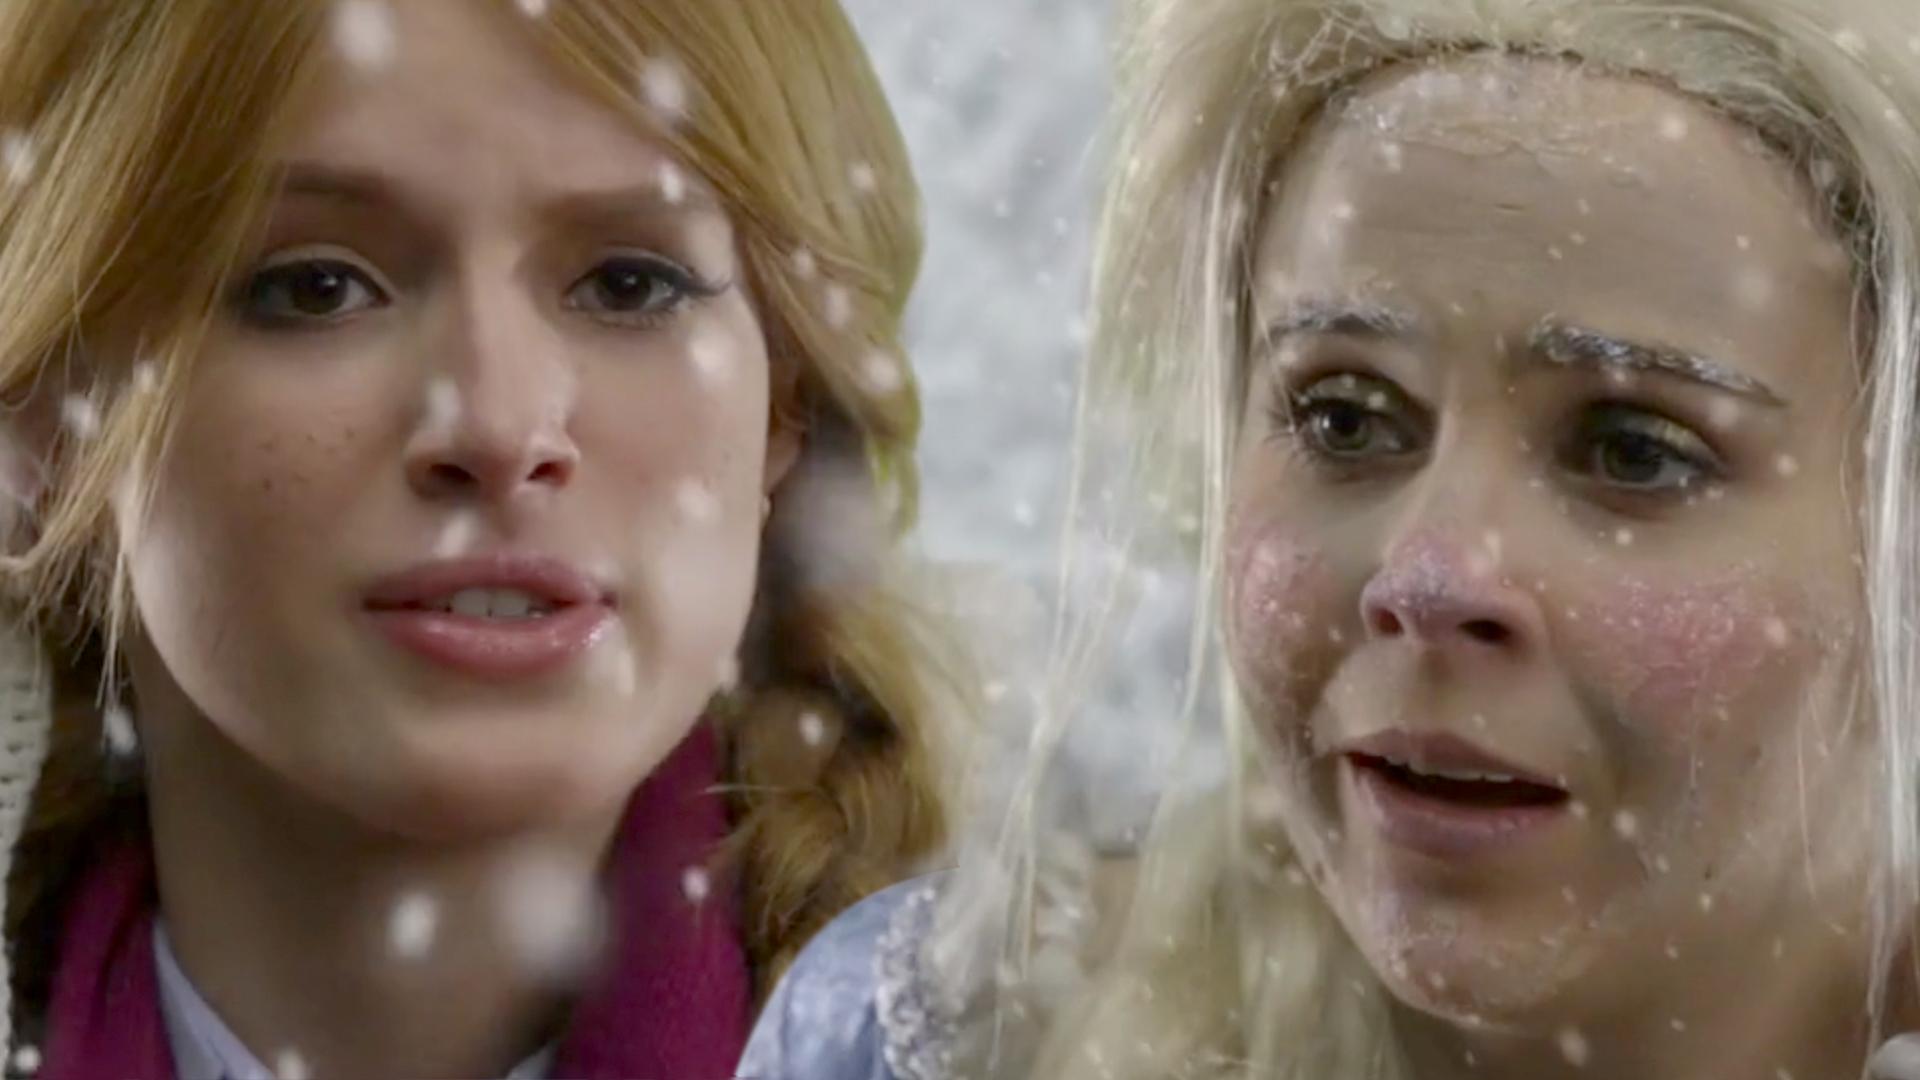 LIVE ACTION FROZEN - Featuring Mae Whitman & Bella Thorne